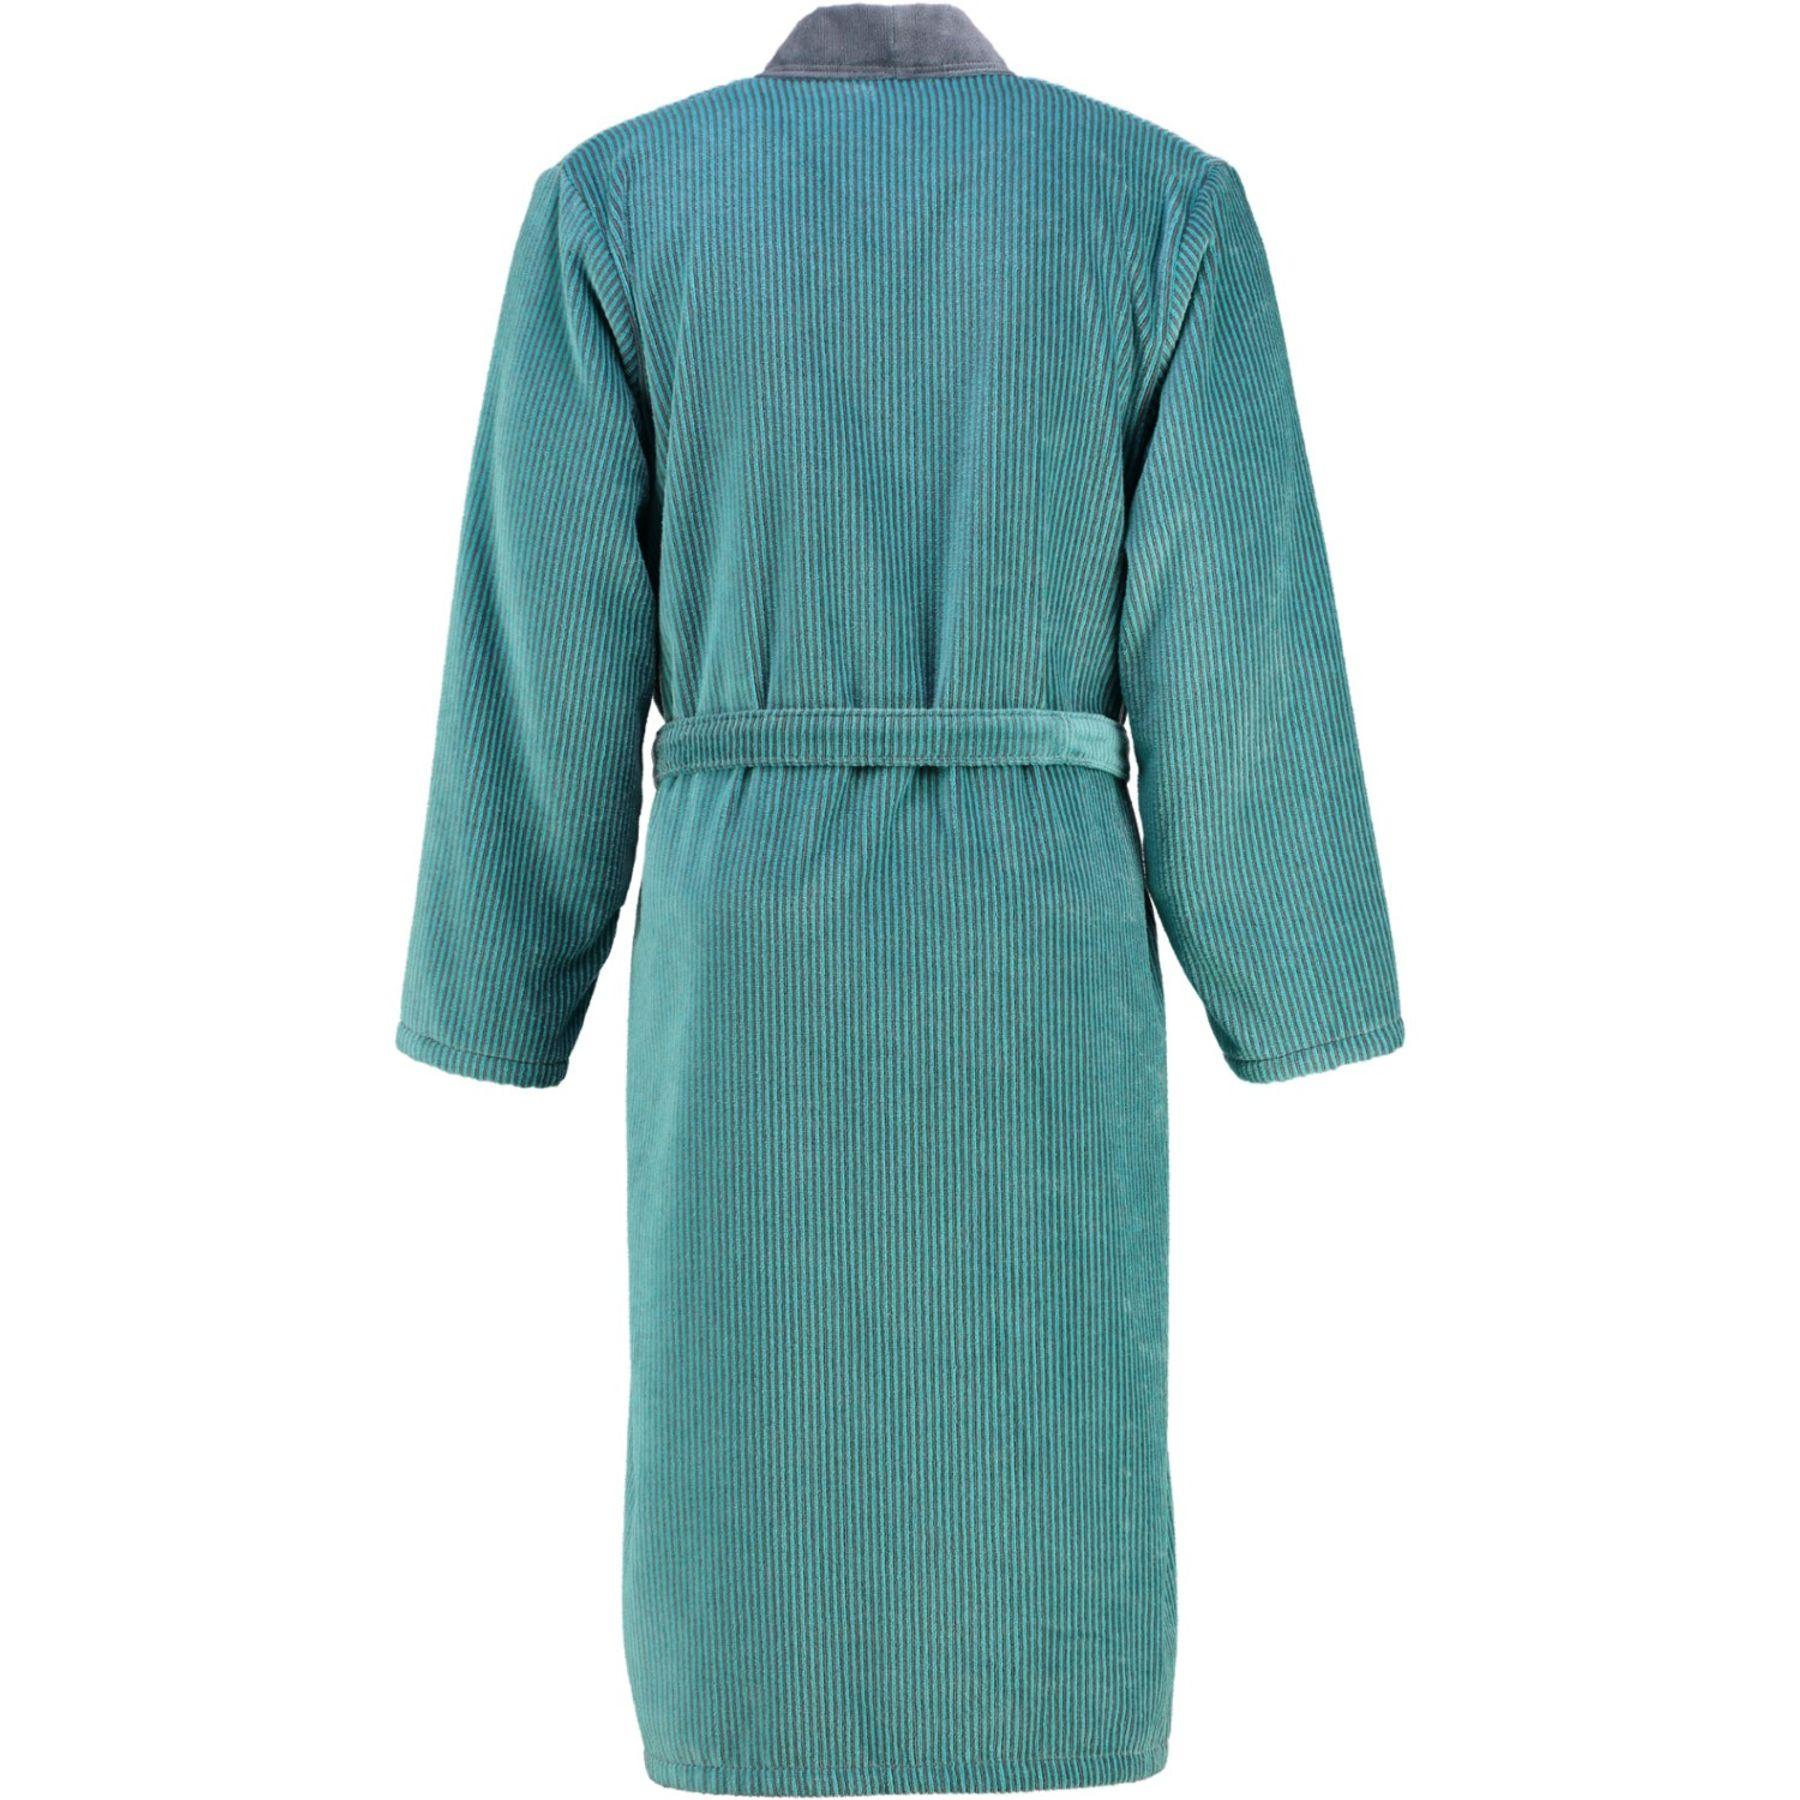 Cawö - Herren Velours Bademantel in Kimono Form (5840) – Bild 2